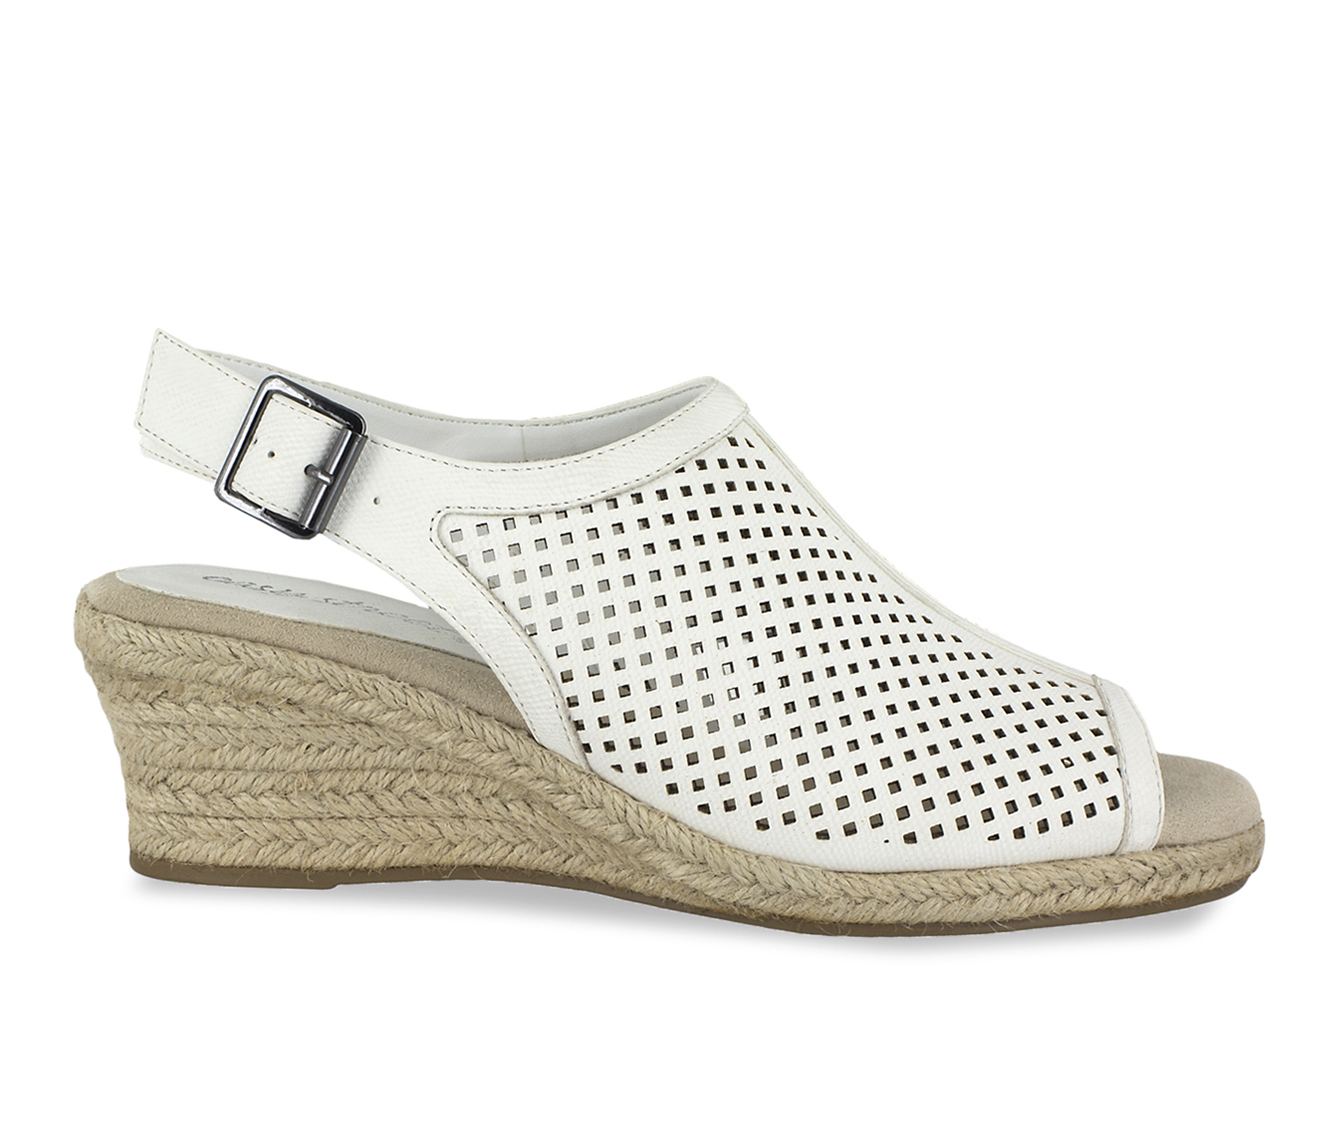 Easy Street Stacy Women's Dress Shoe (White Faux Leather)